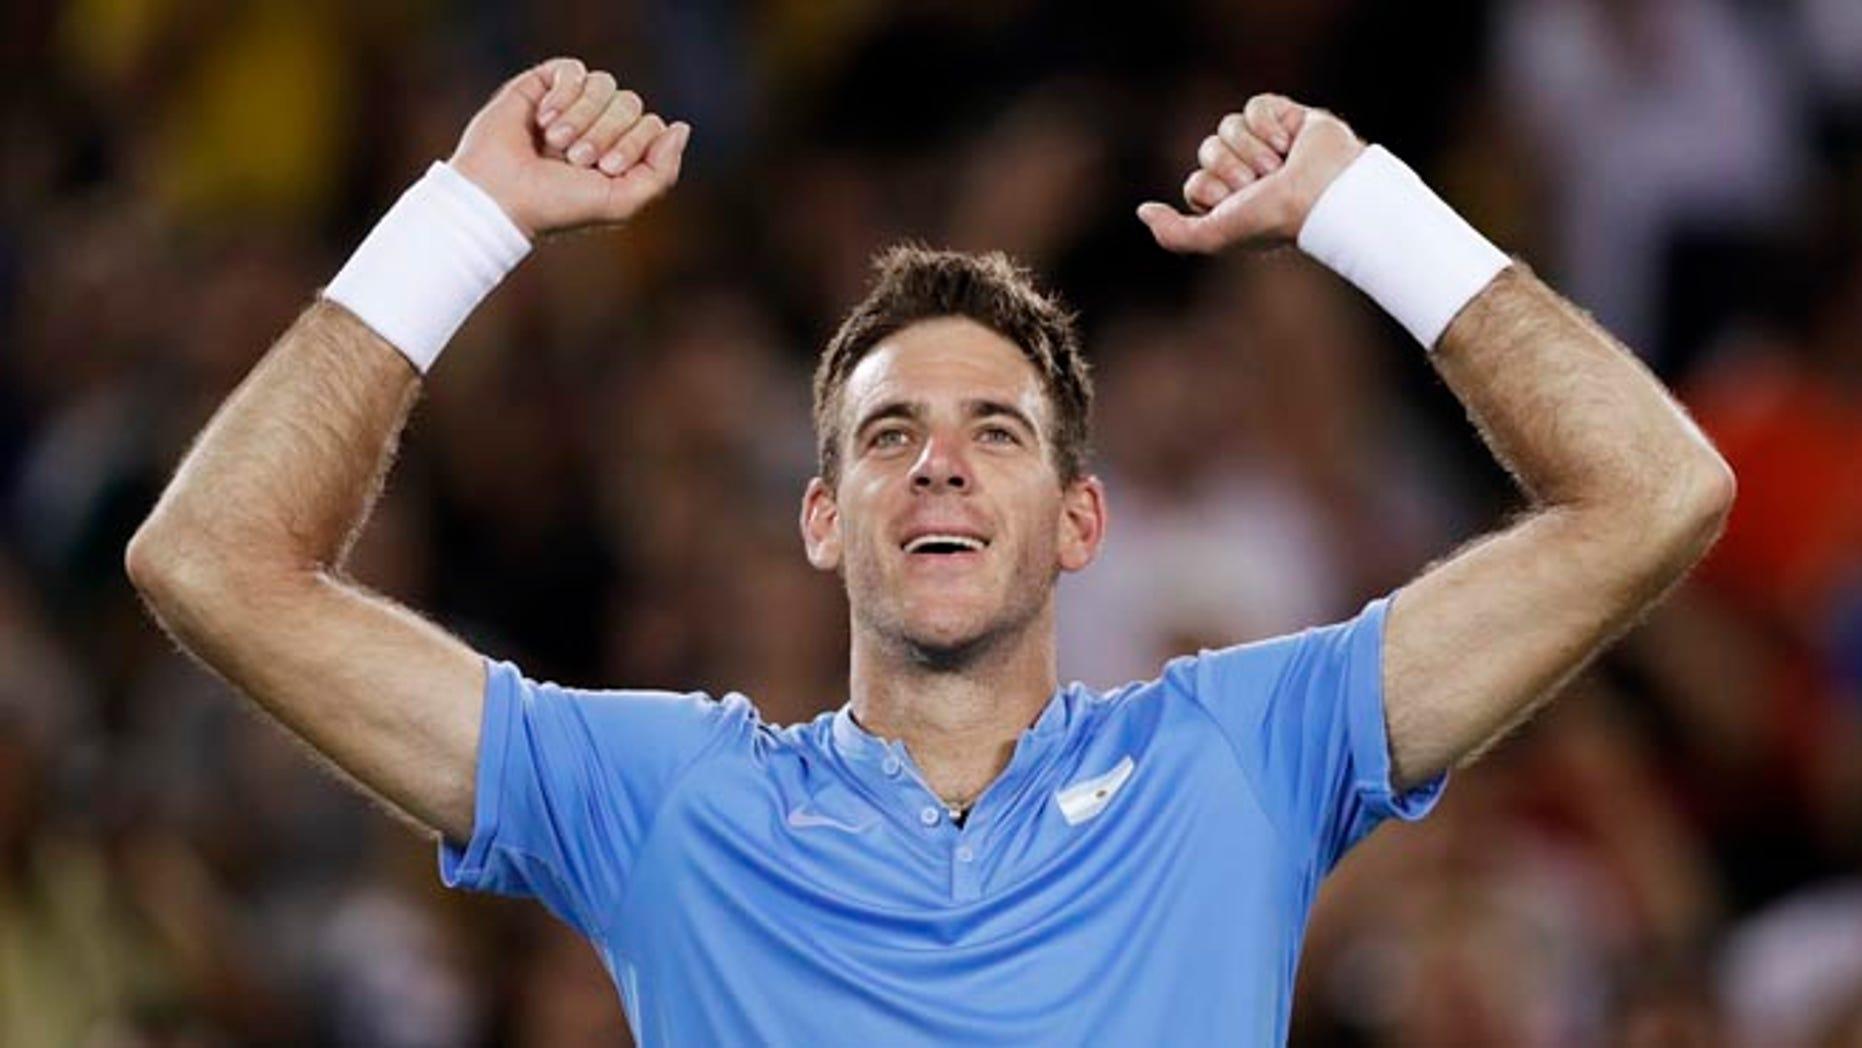 Juan Martin del Potro, of Argentina, raises his arms after defeating Novak Djokovic, of Serbia, at the 2016 Summer Olympics in Rio de Janeiro, Brazil, Sunday, Aug. 7, 2016. (AP Photo/Charles Krupa)